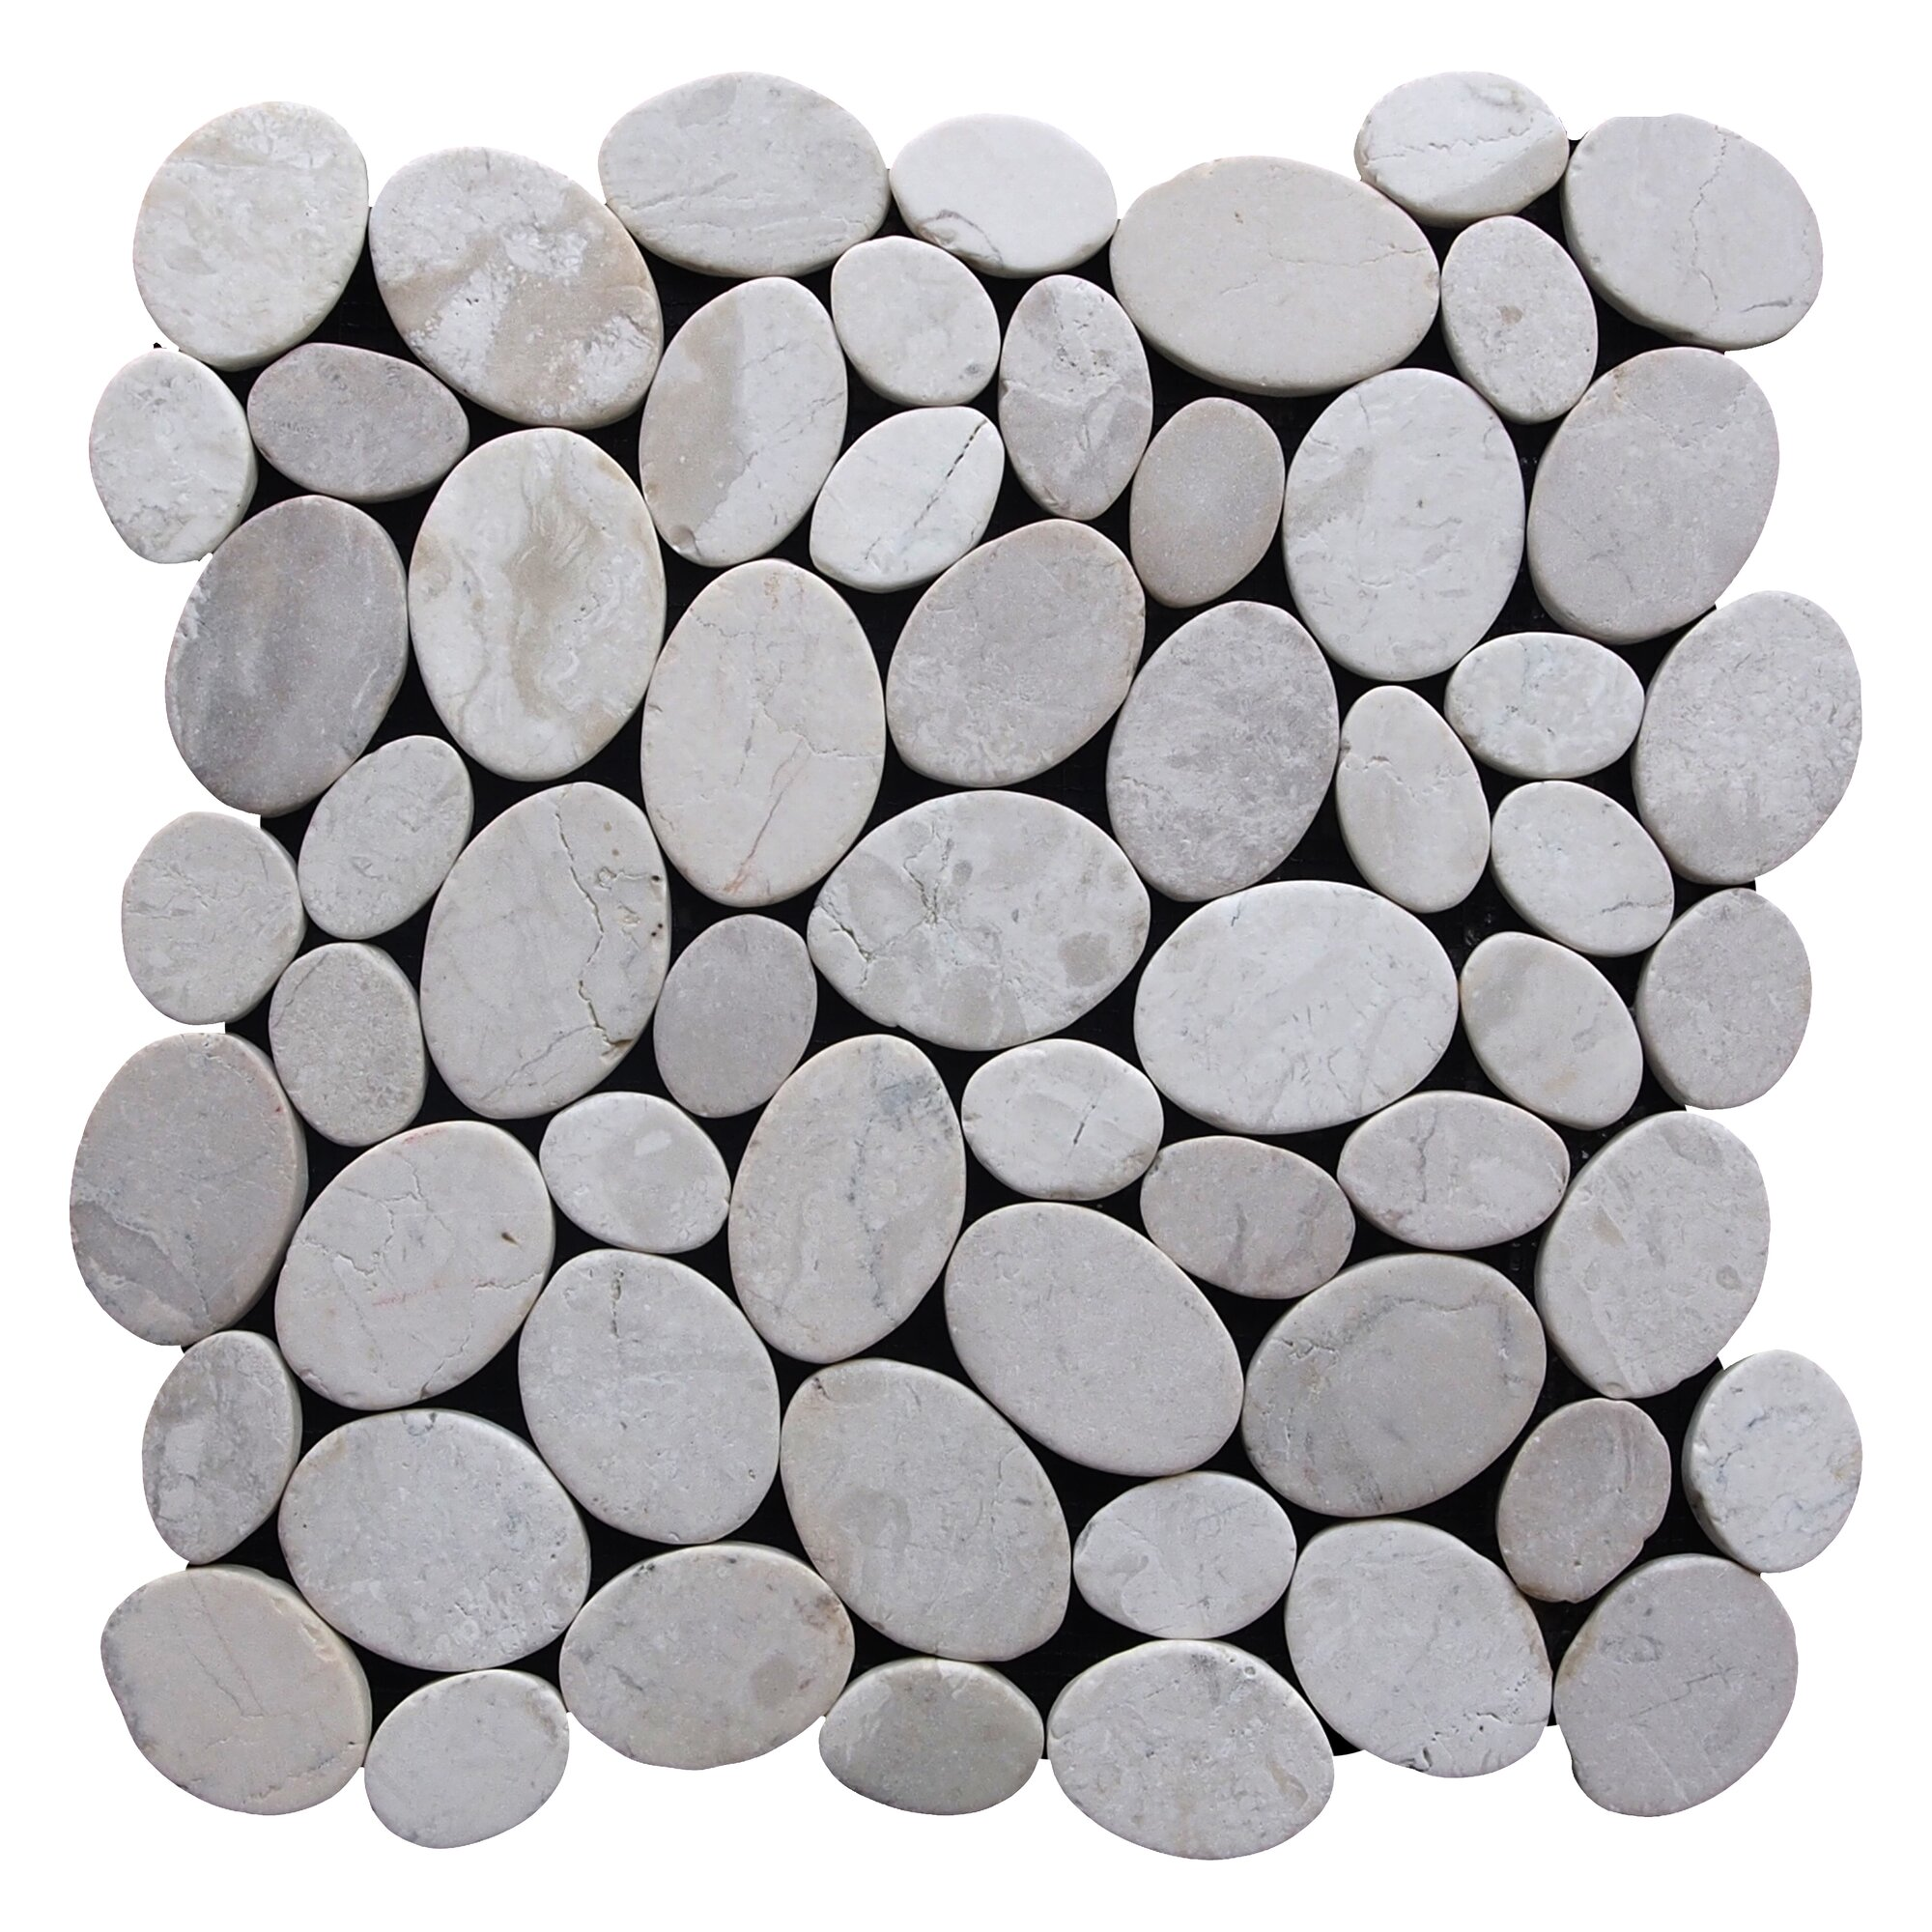 Pebble Stone Tile >> Pebble Tile Coin Random Sized Natural Stone Pebble Tile in